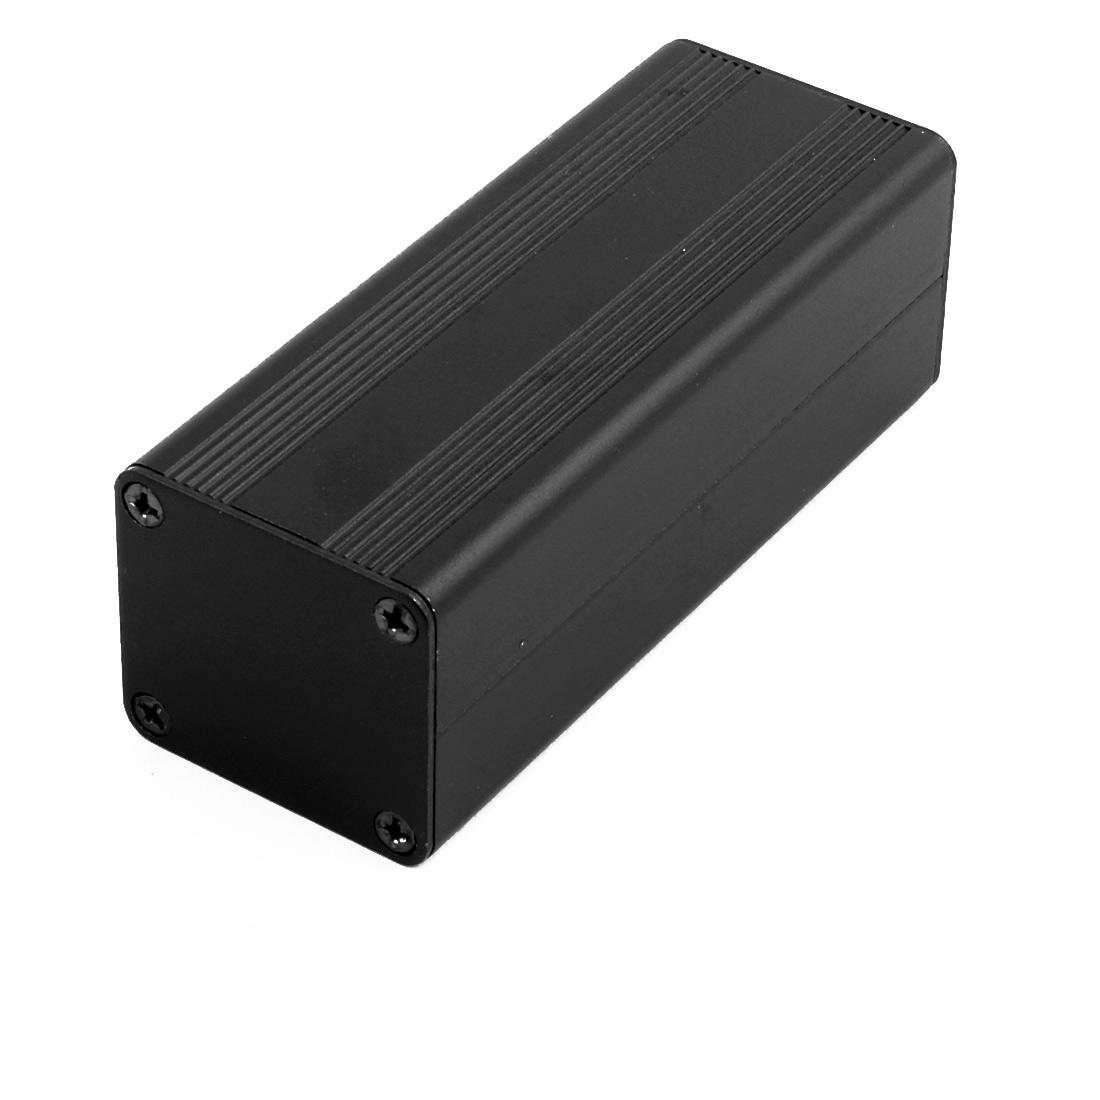 81mmx32mmx28mm Multi-purpose Electronic Extruded Aluminum Enclosure Box Black